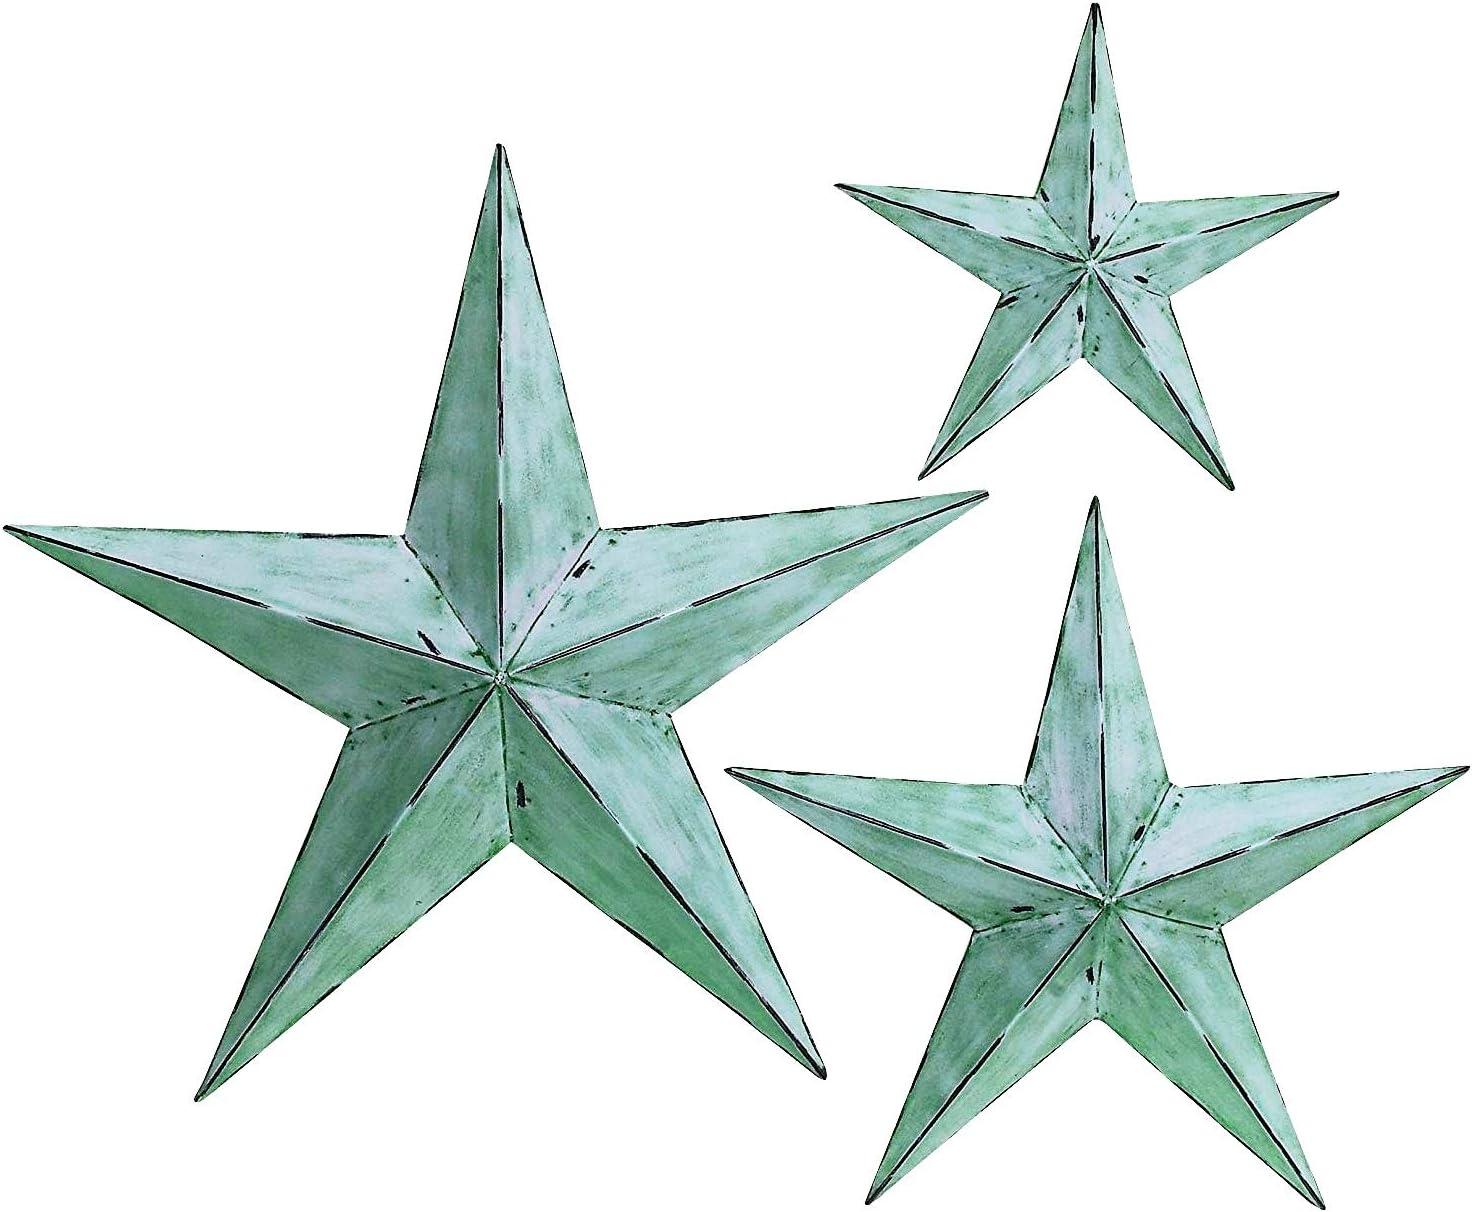 Bellaa 21352 Star Metal Wall Decor Set 3 Green Blue 12/18/24 inch (Greenblue, Large)